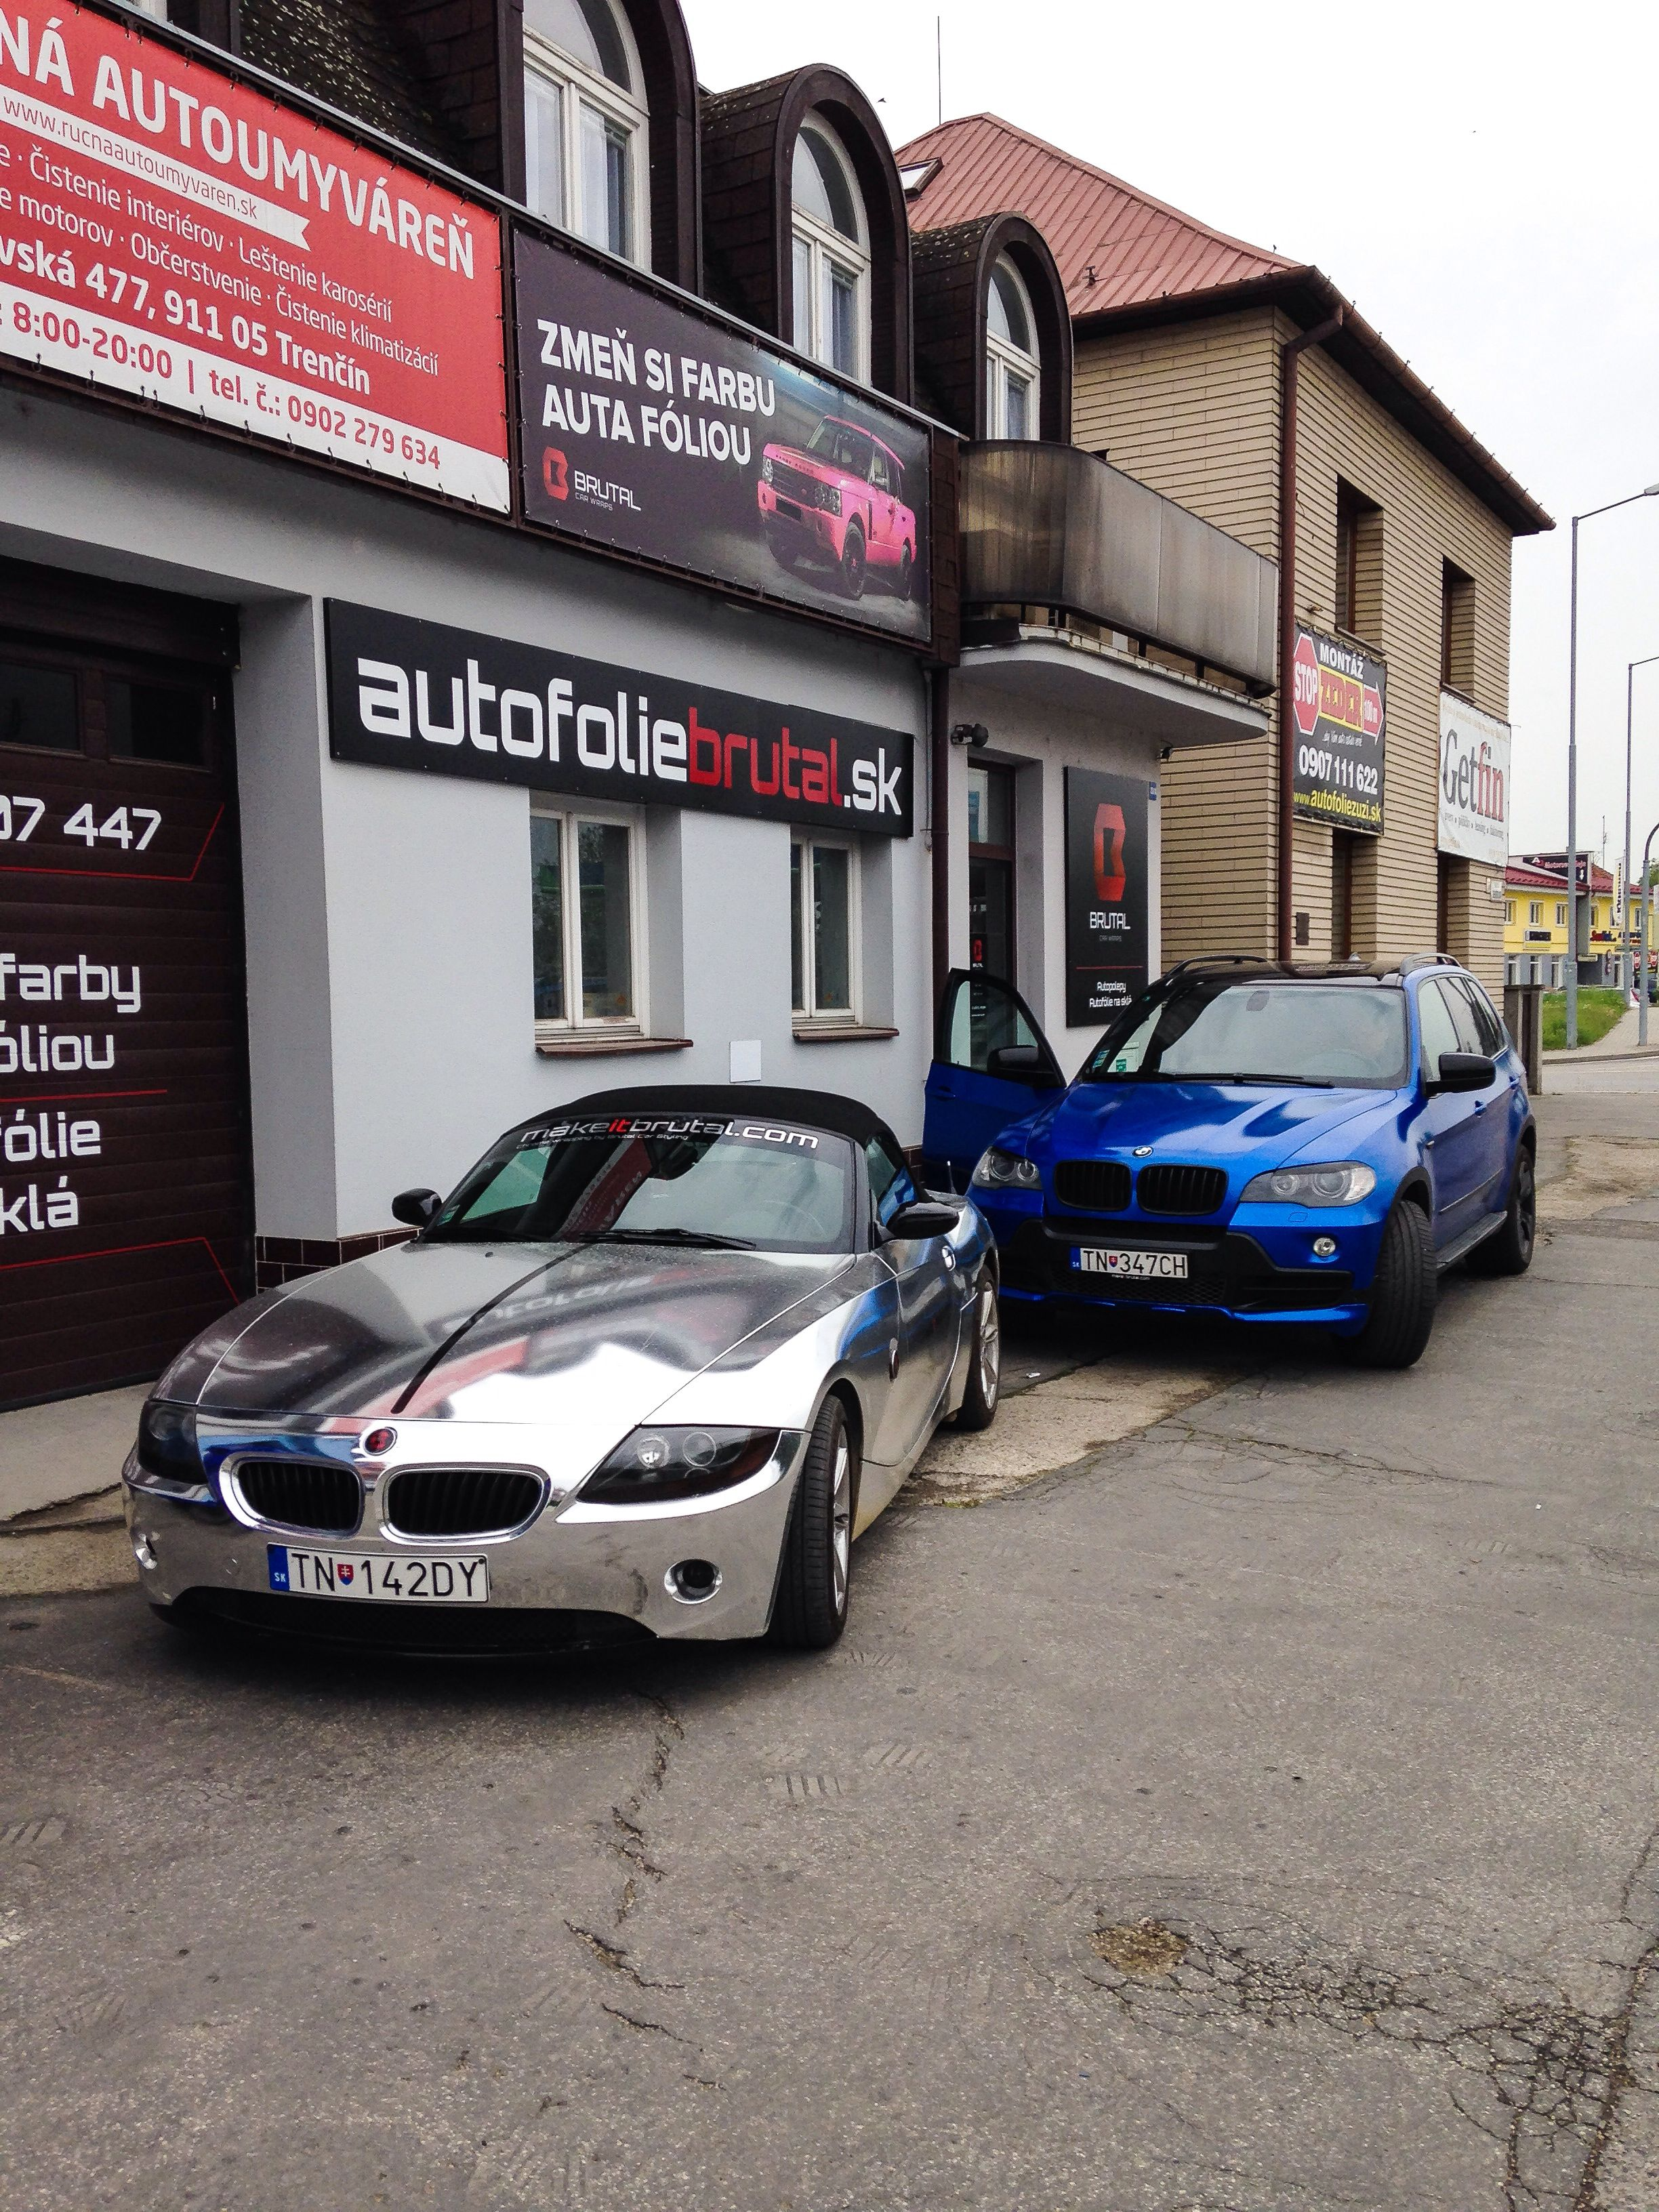 Our Brutal Bmw Z4 Chrome Amp Brutal Bmw X5 Blue Starlight